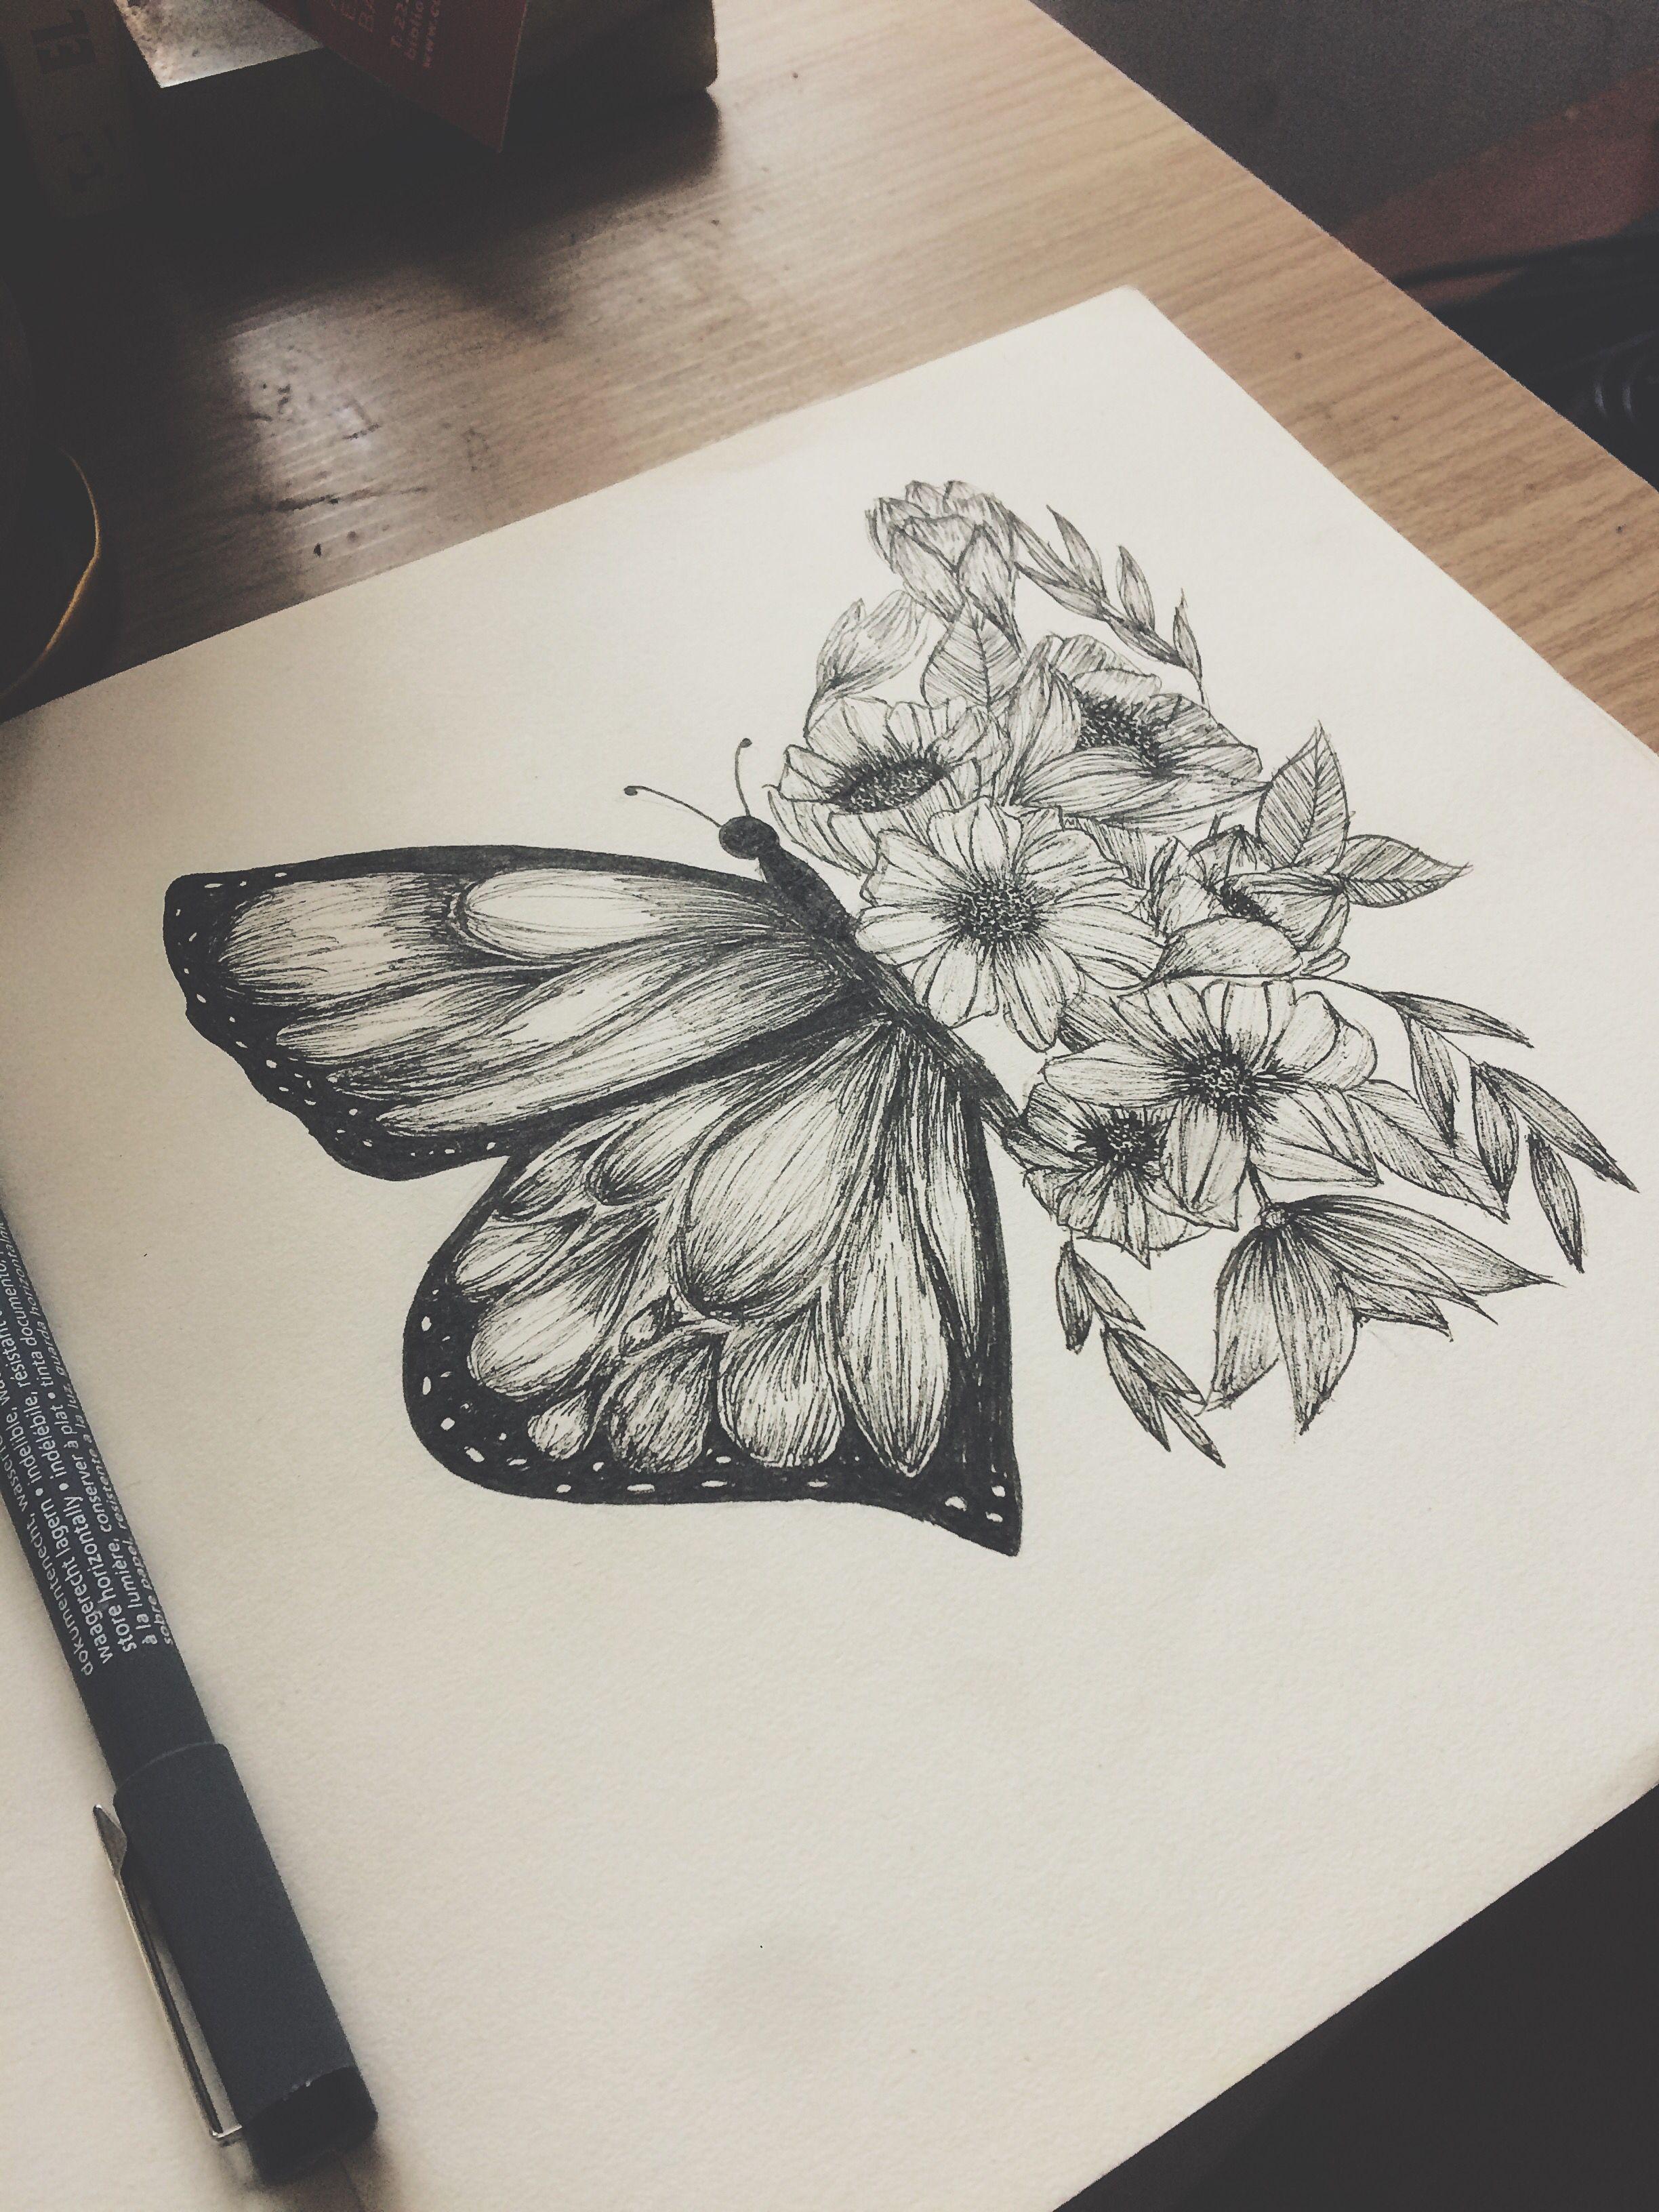 Pin De Leticia Mendoza En Yio Dibujos A Lapicero Flores Dibujadas A Lapiz Dibujos A Lapis